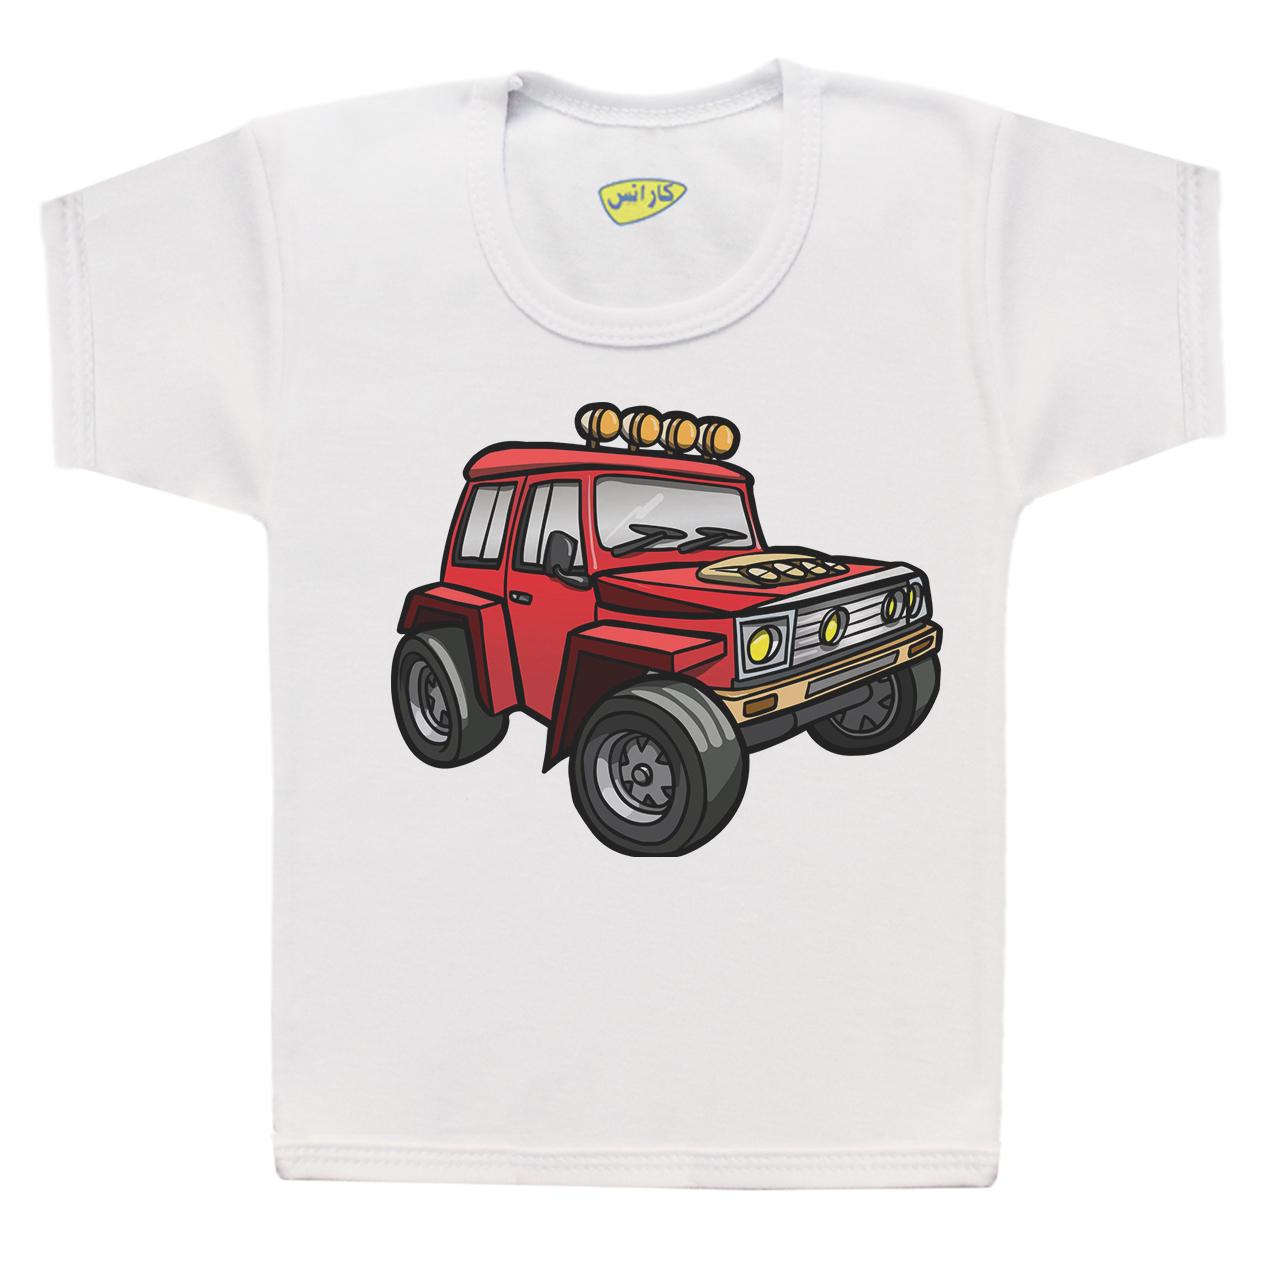 تی شرت پسرانه کارانس طرح آفرود مدل BT-247